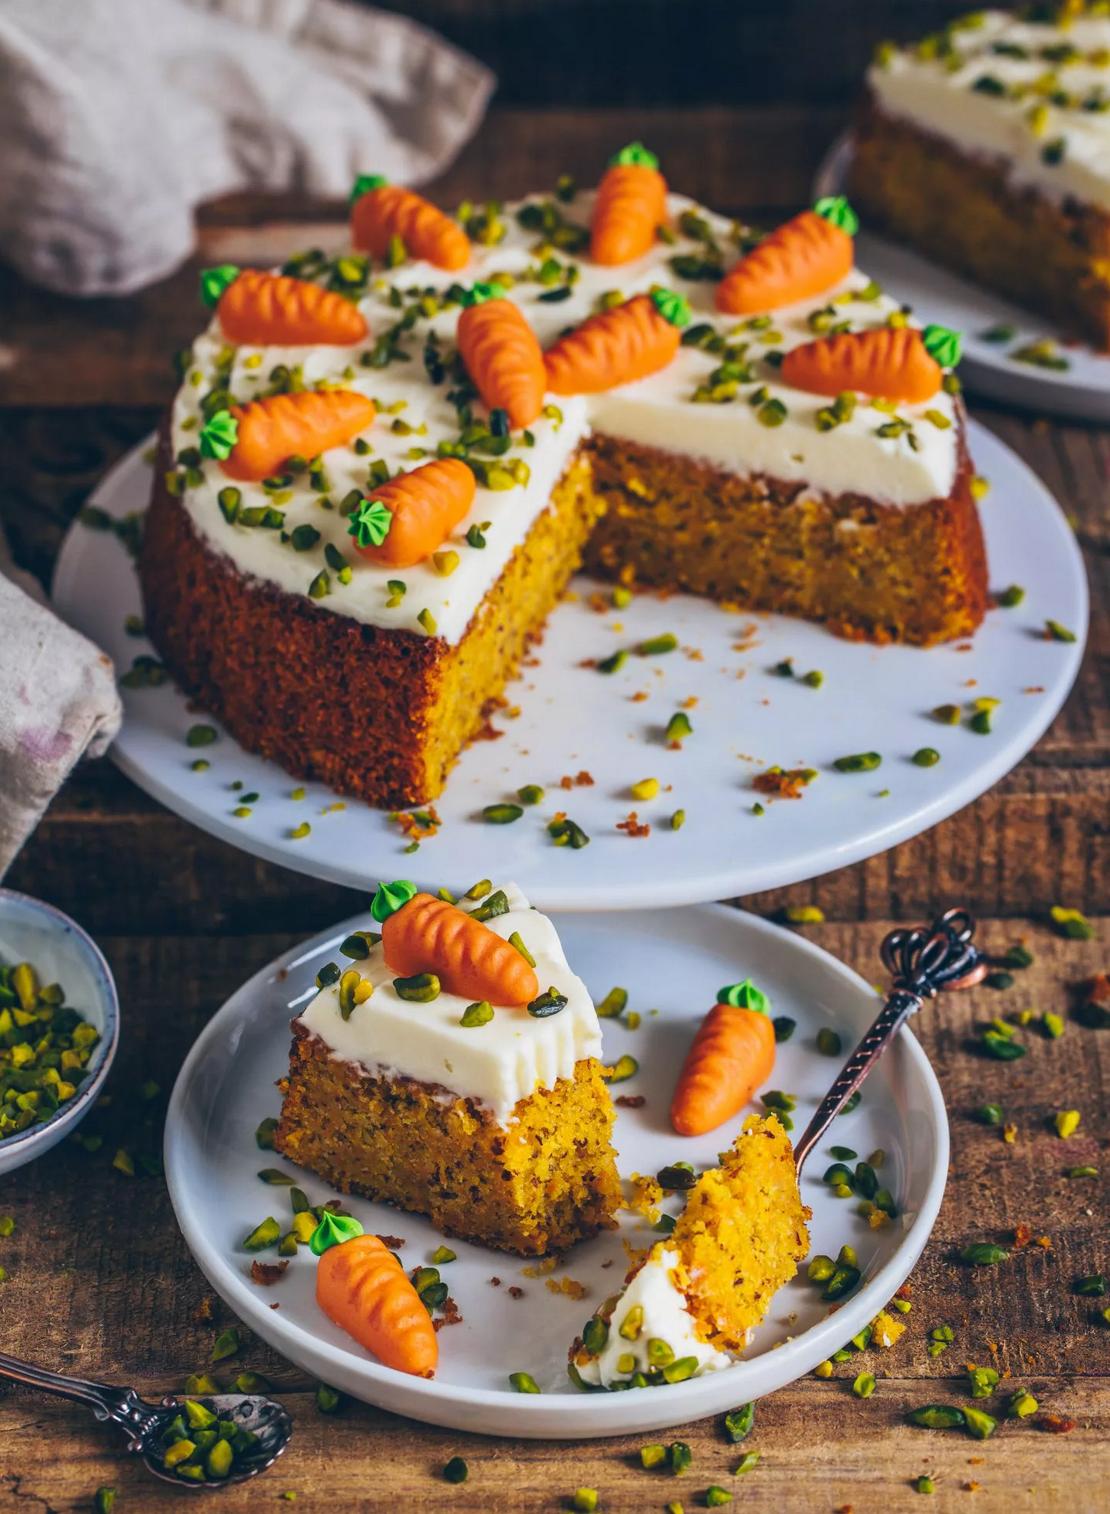 10 Carrot Cake Lieblingsrezepte & die besten Carrot Cake Waffeln!